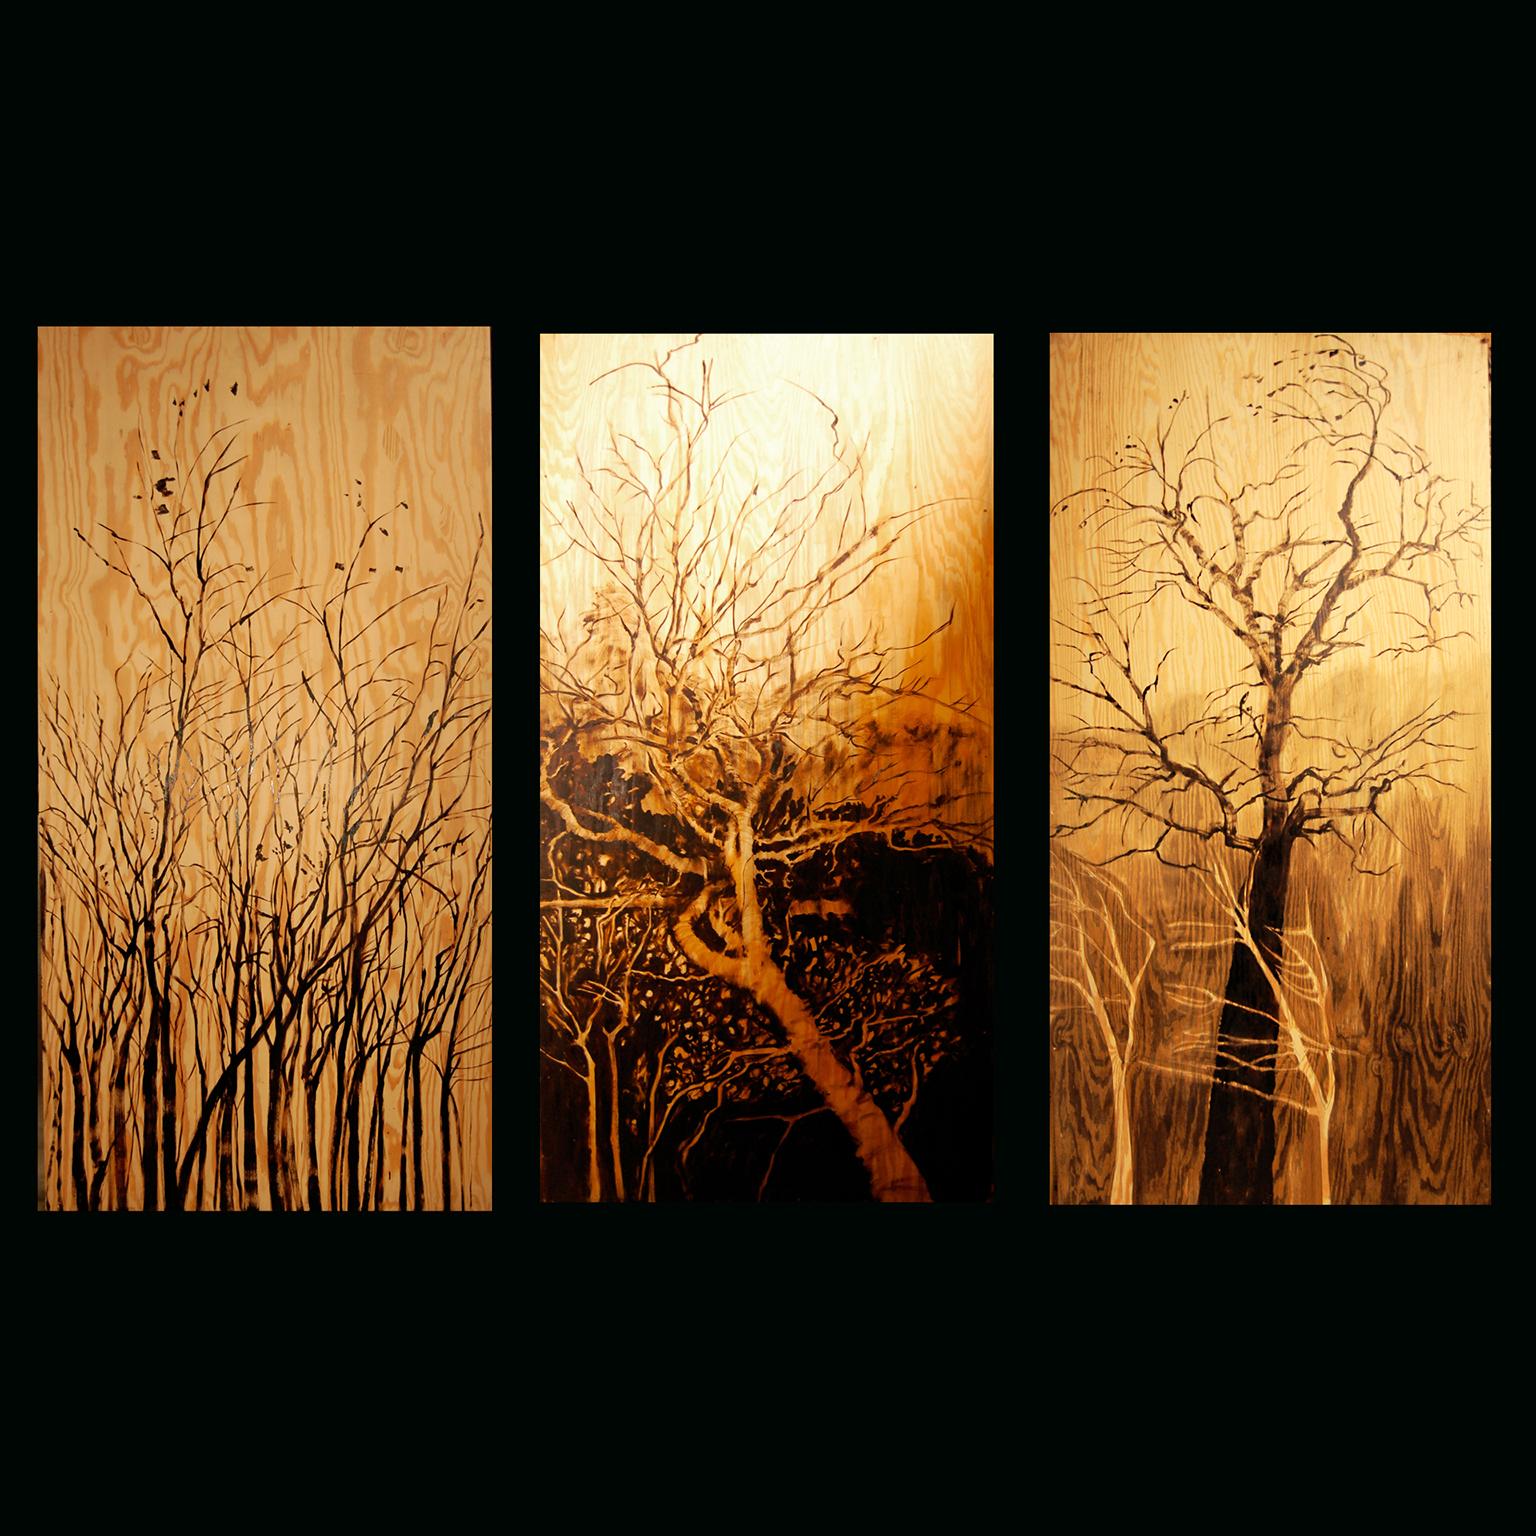 Trees in Season